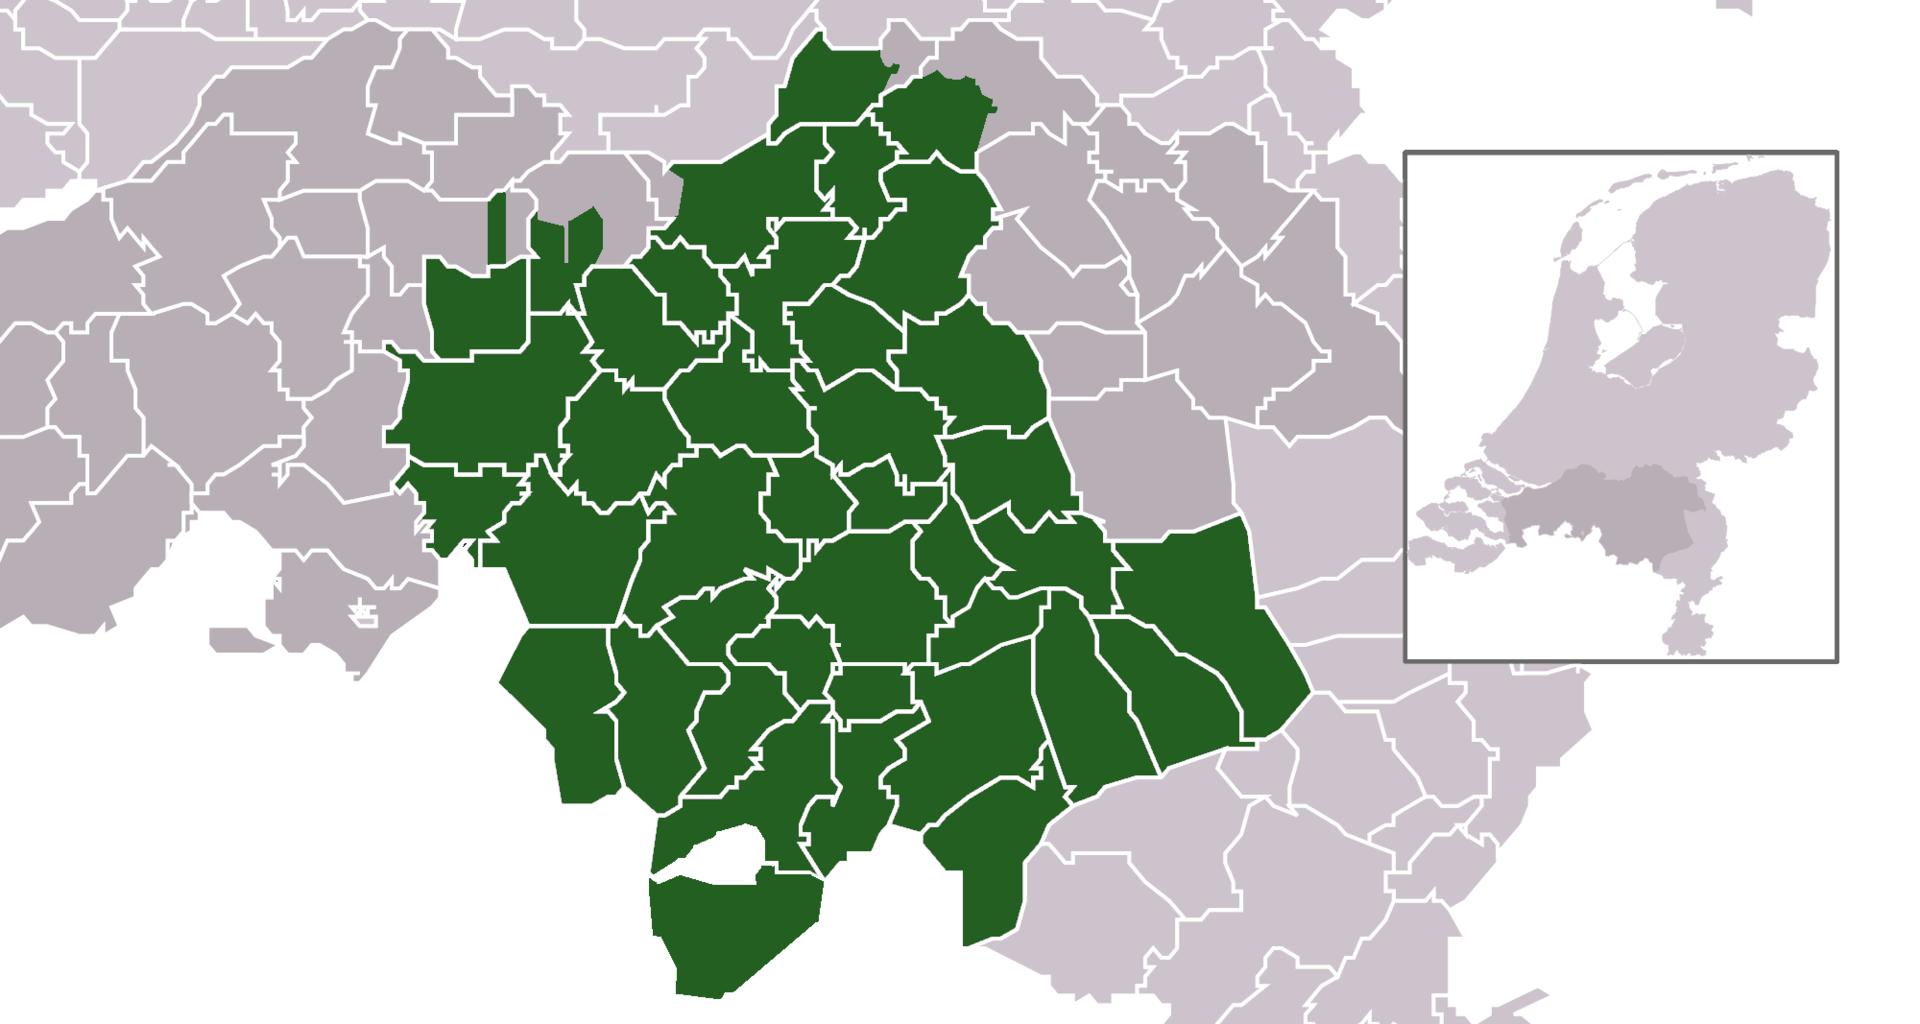 1920px-Map_-_NL_-_Municipality_Meierij_Historical.png